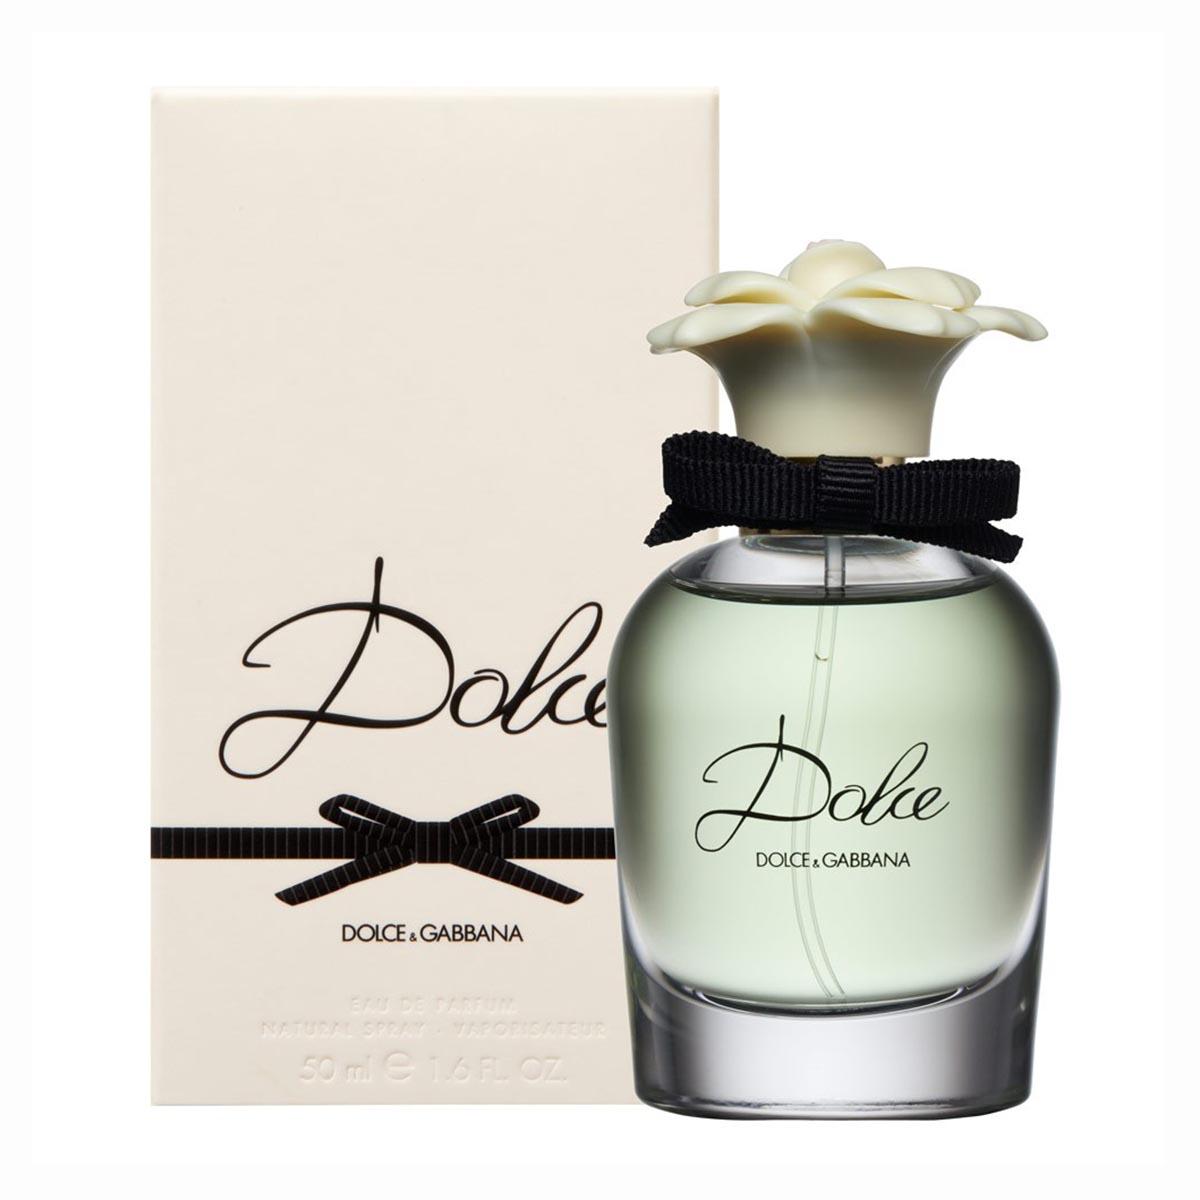 Dolce gabbana dolce eau de parfum 50ml vaporizador